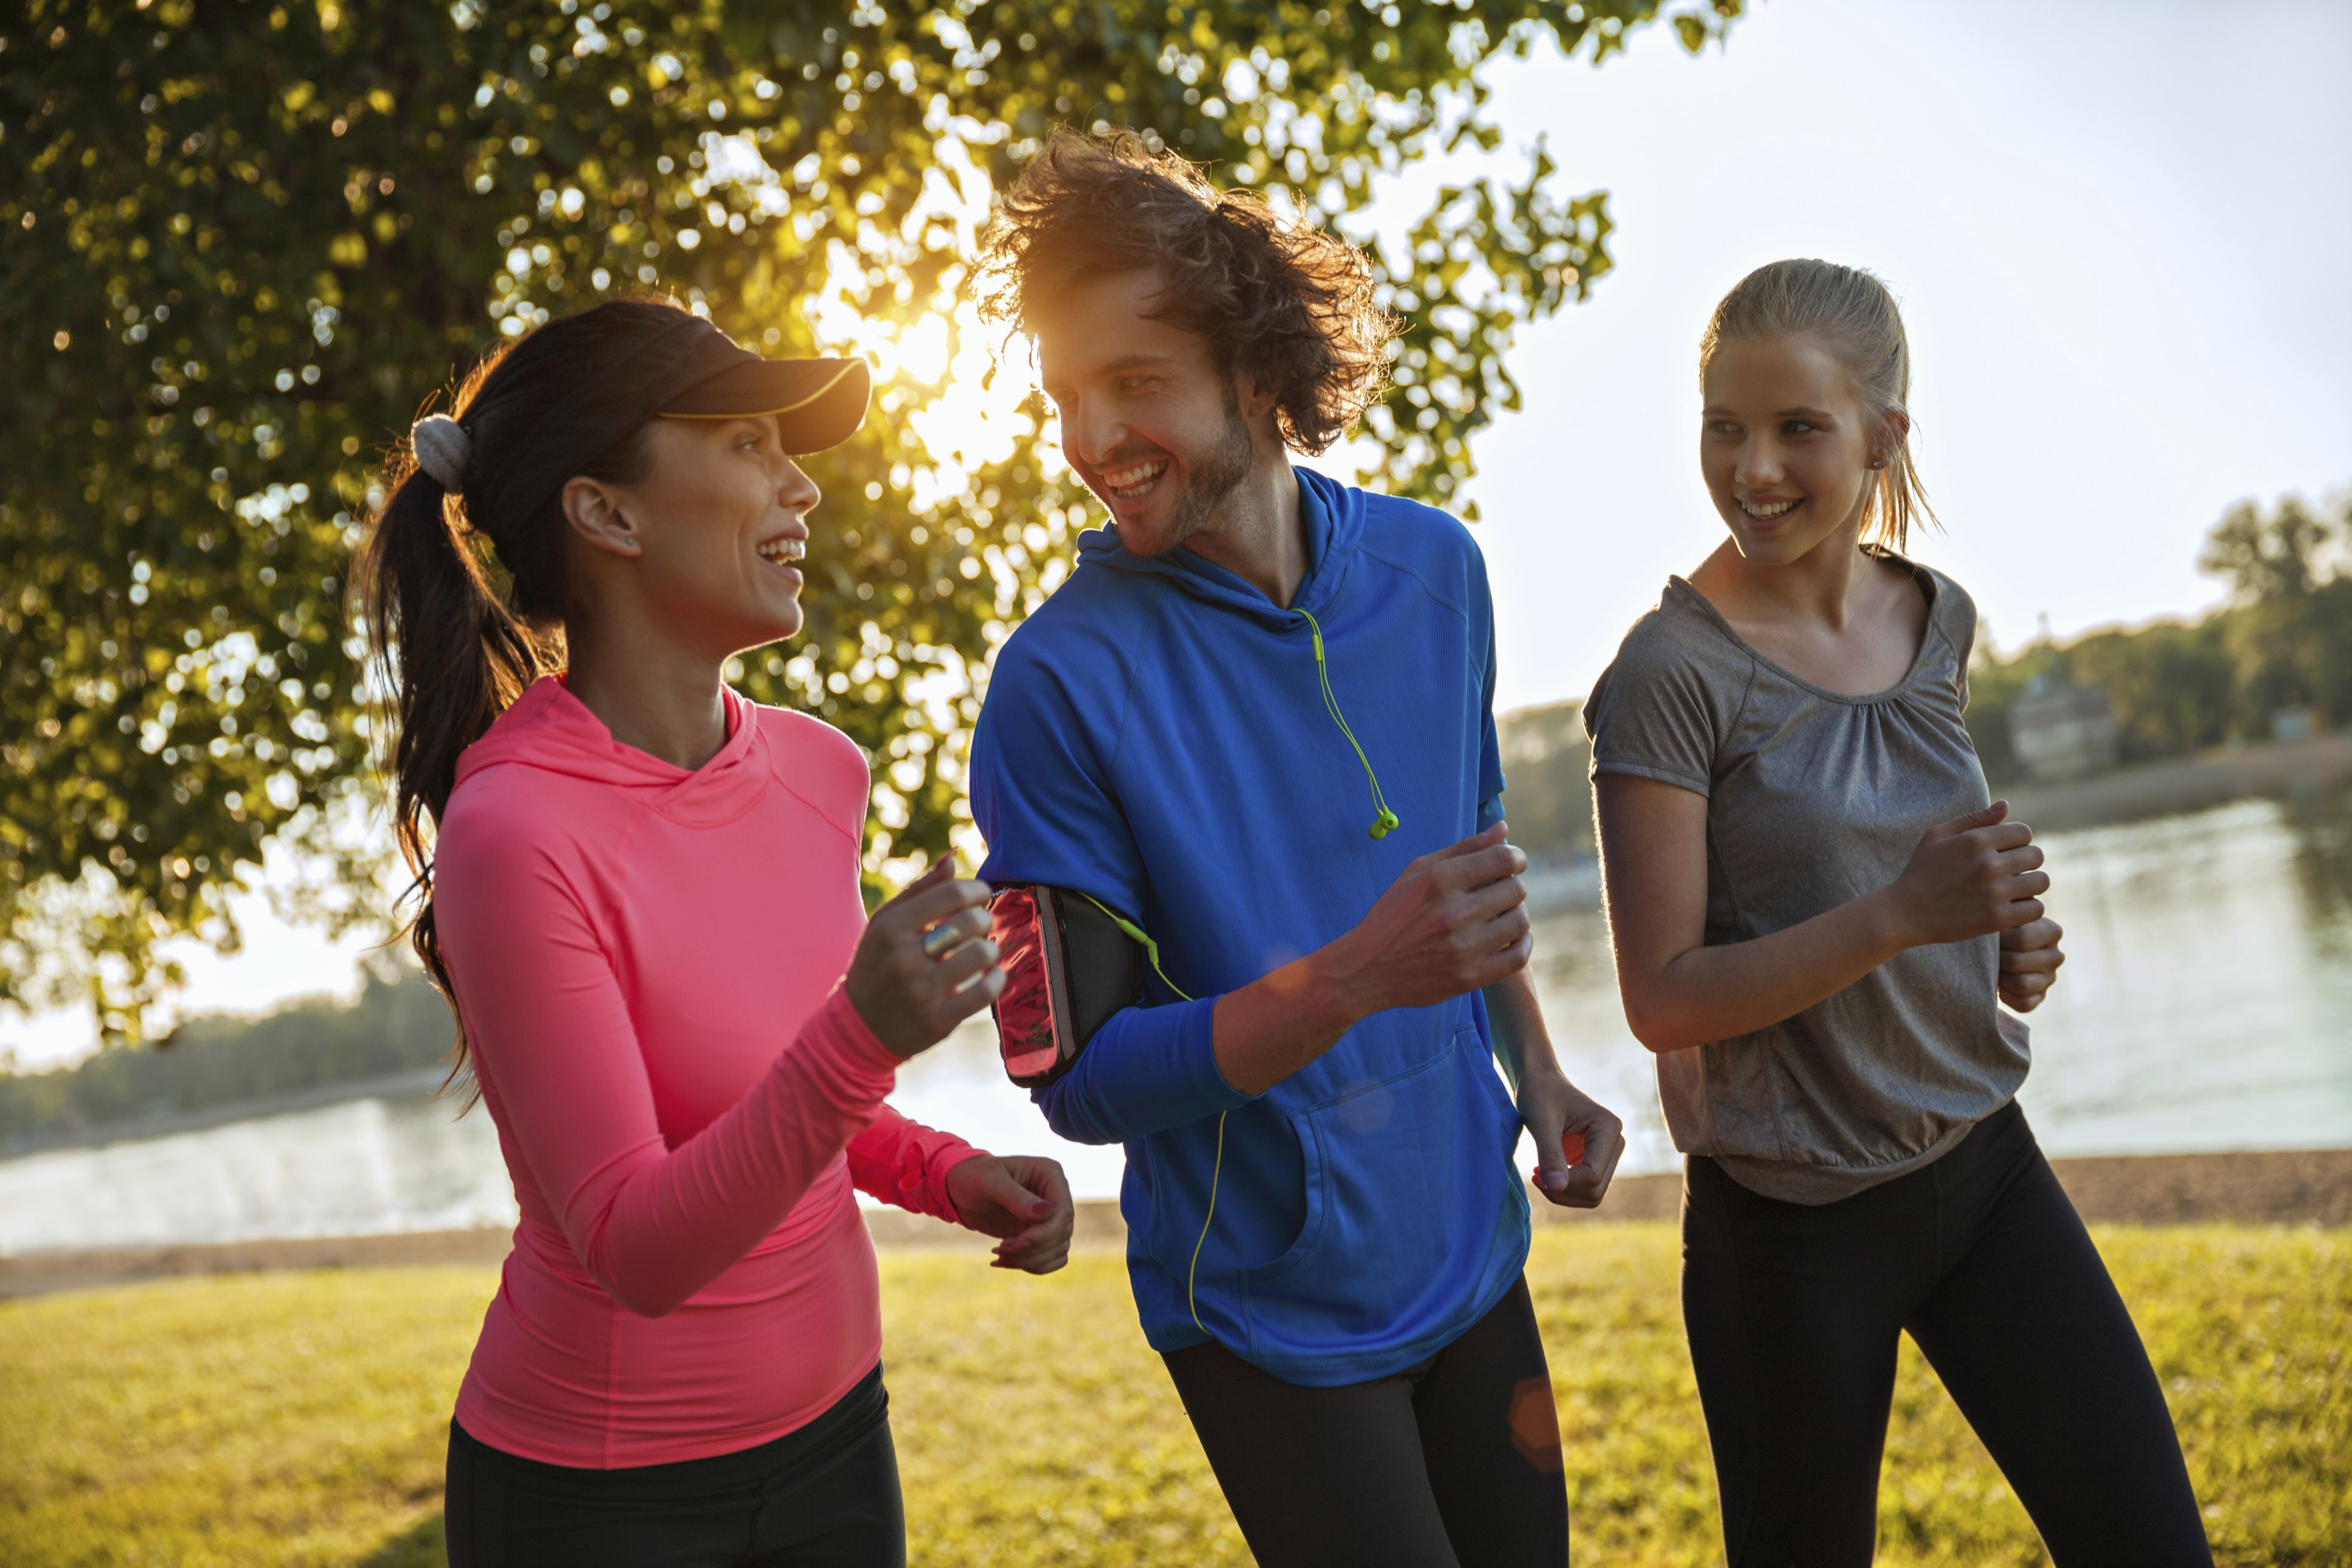 How To Do The Run Walk Method